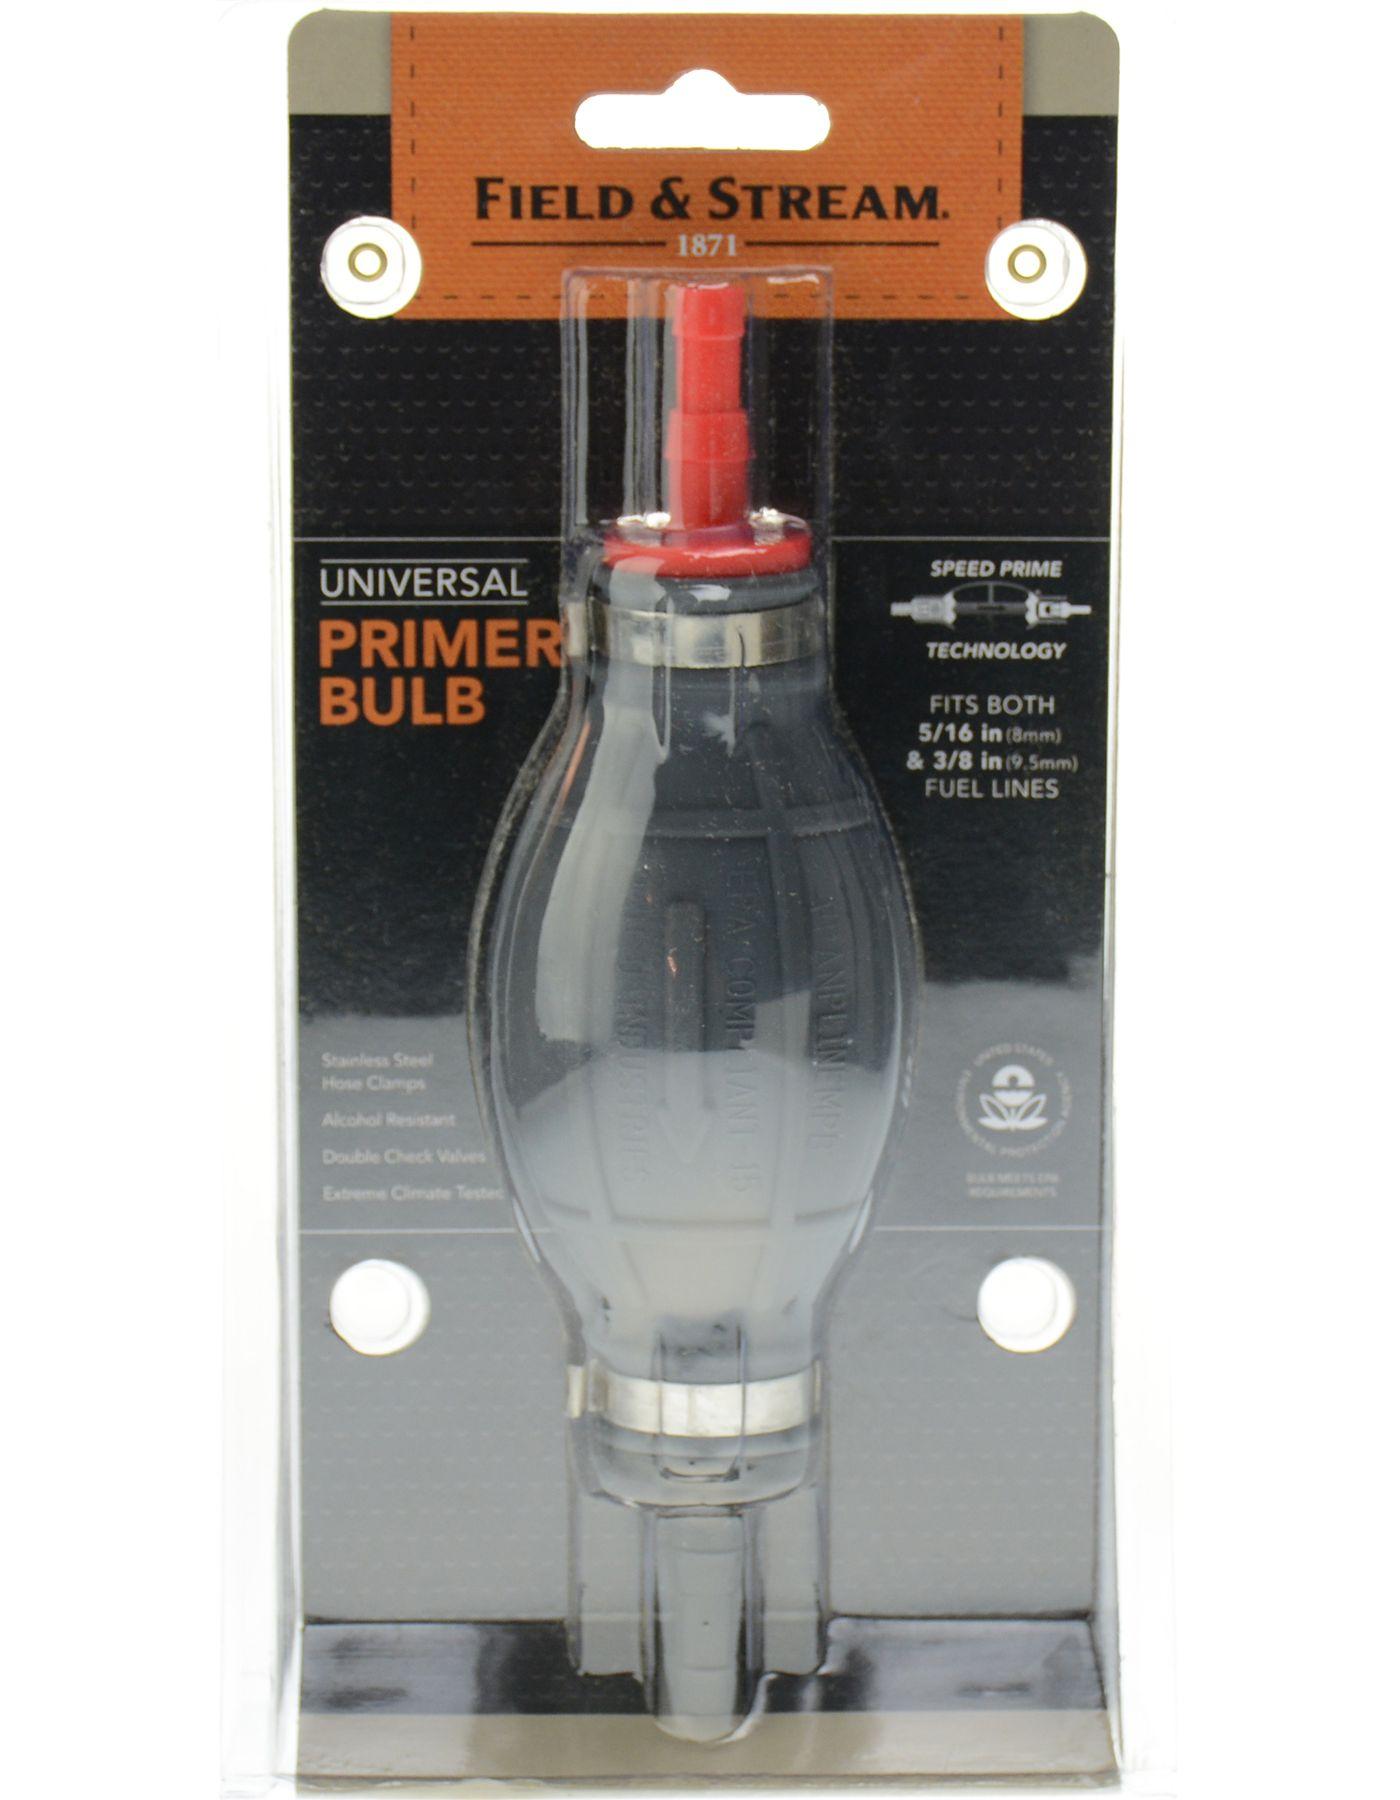 Field & Stream Universal Primer Bulb